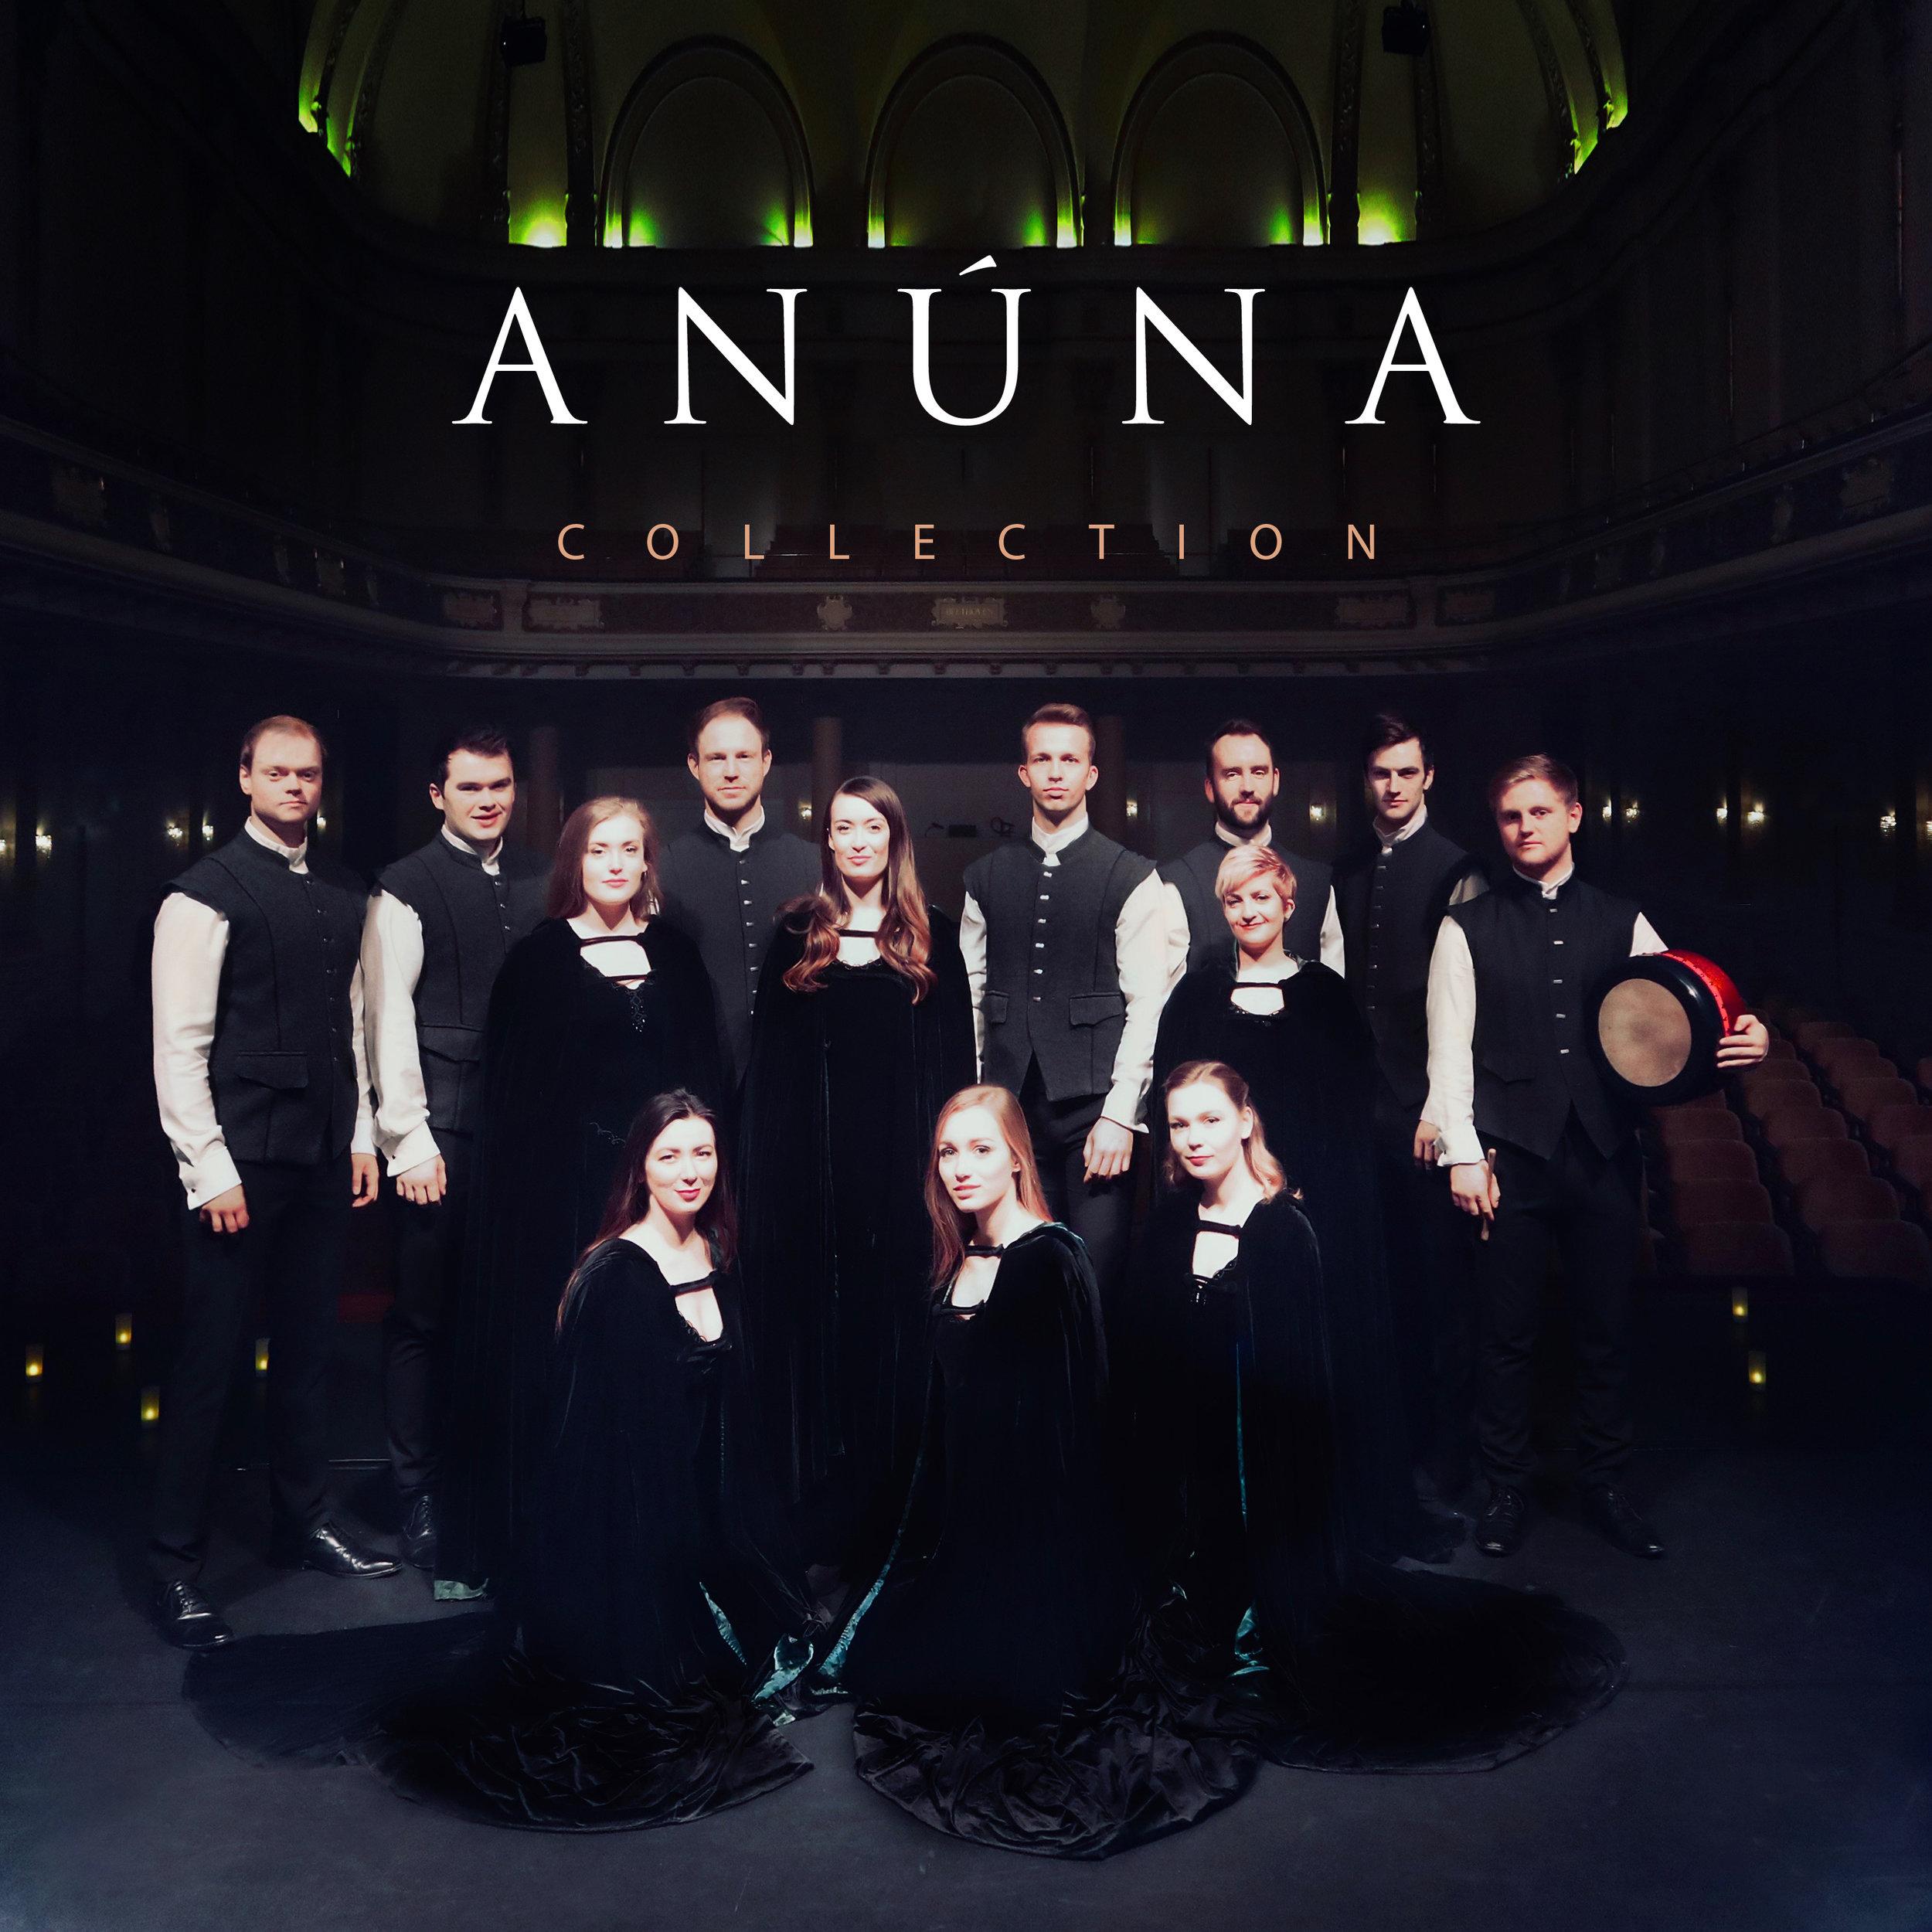 ANUNA-Collection.jpg